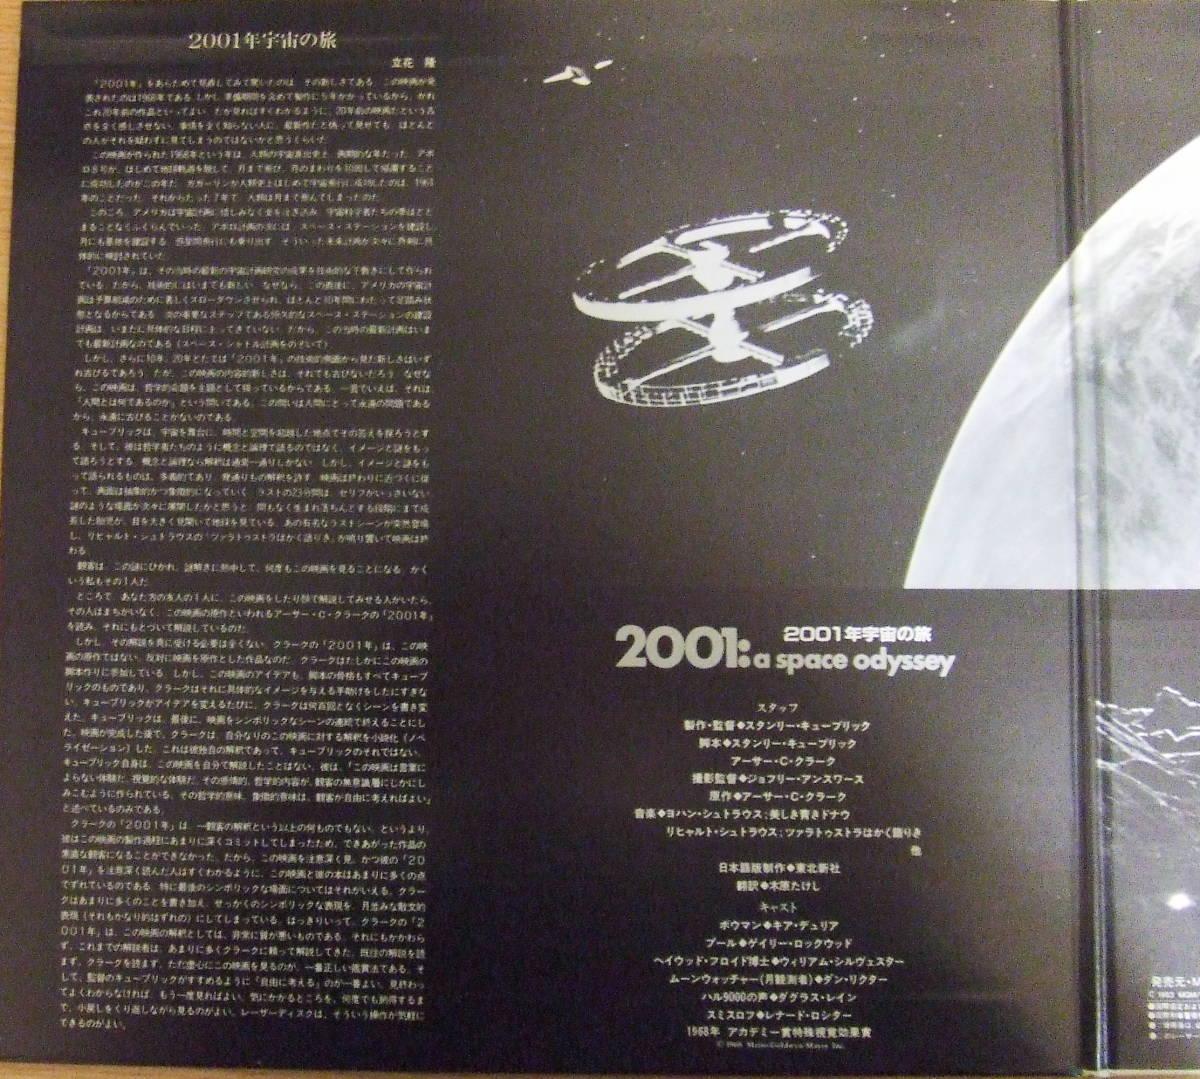 LD「2001:a space odyssey 2001年宇宙の旅 スタンリー・キューブリック」中古レーザーディスク_画像3